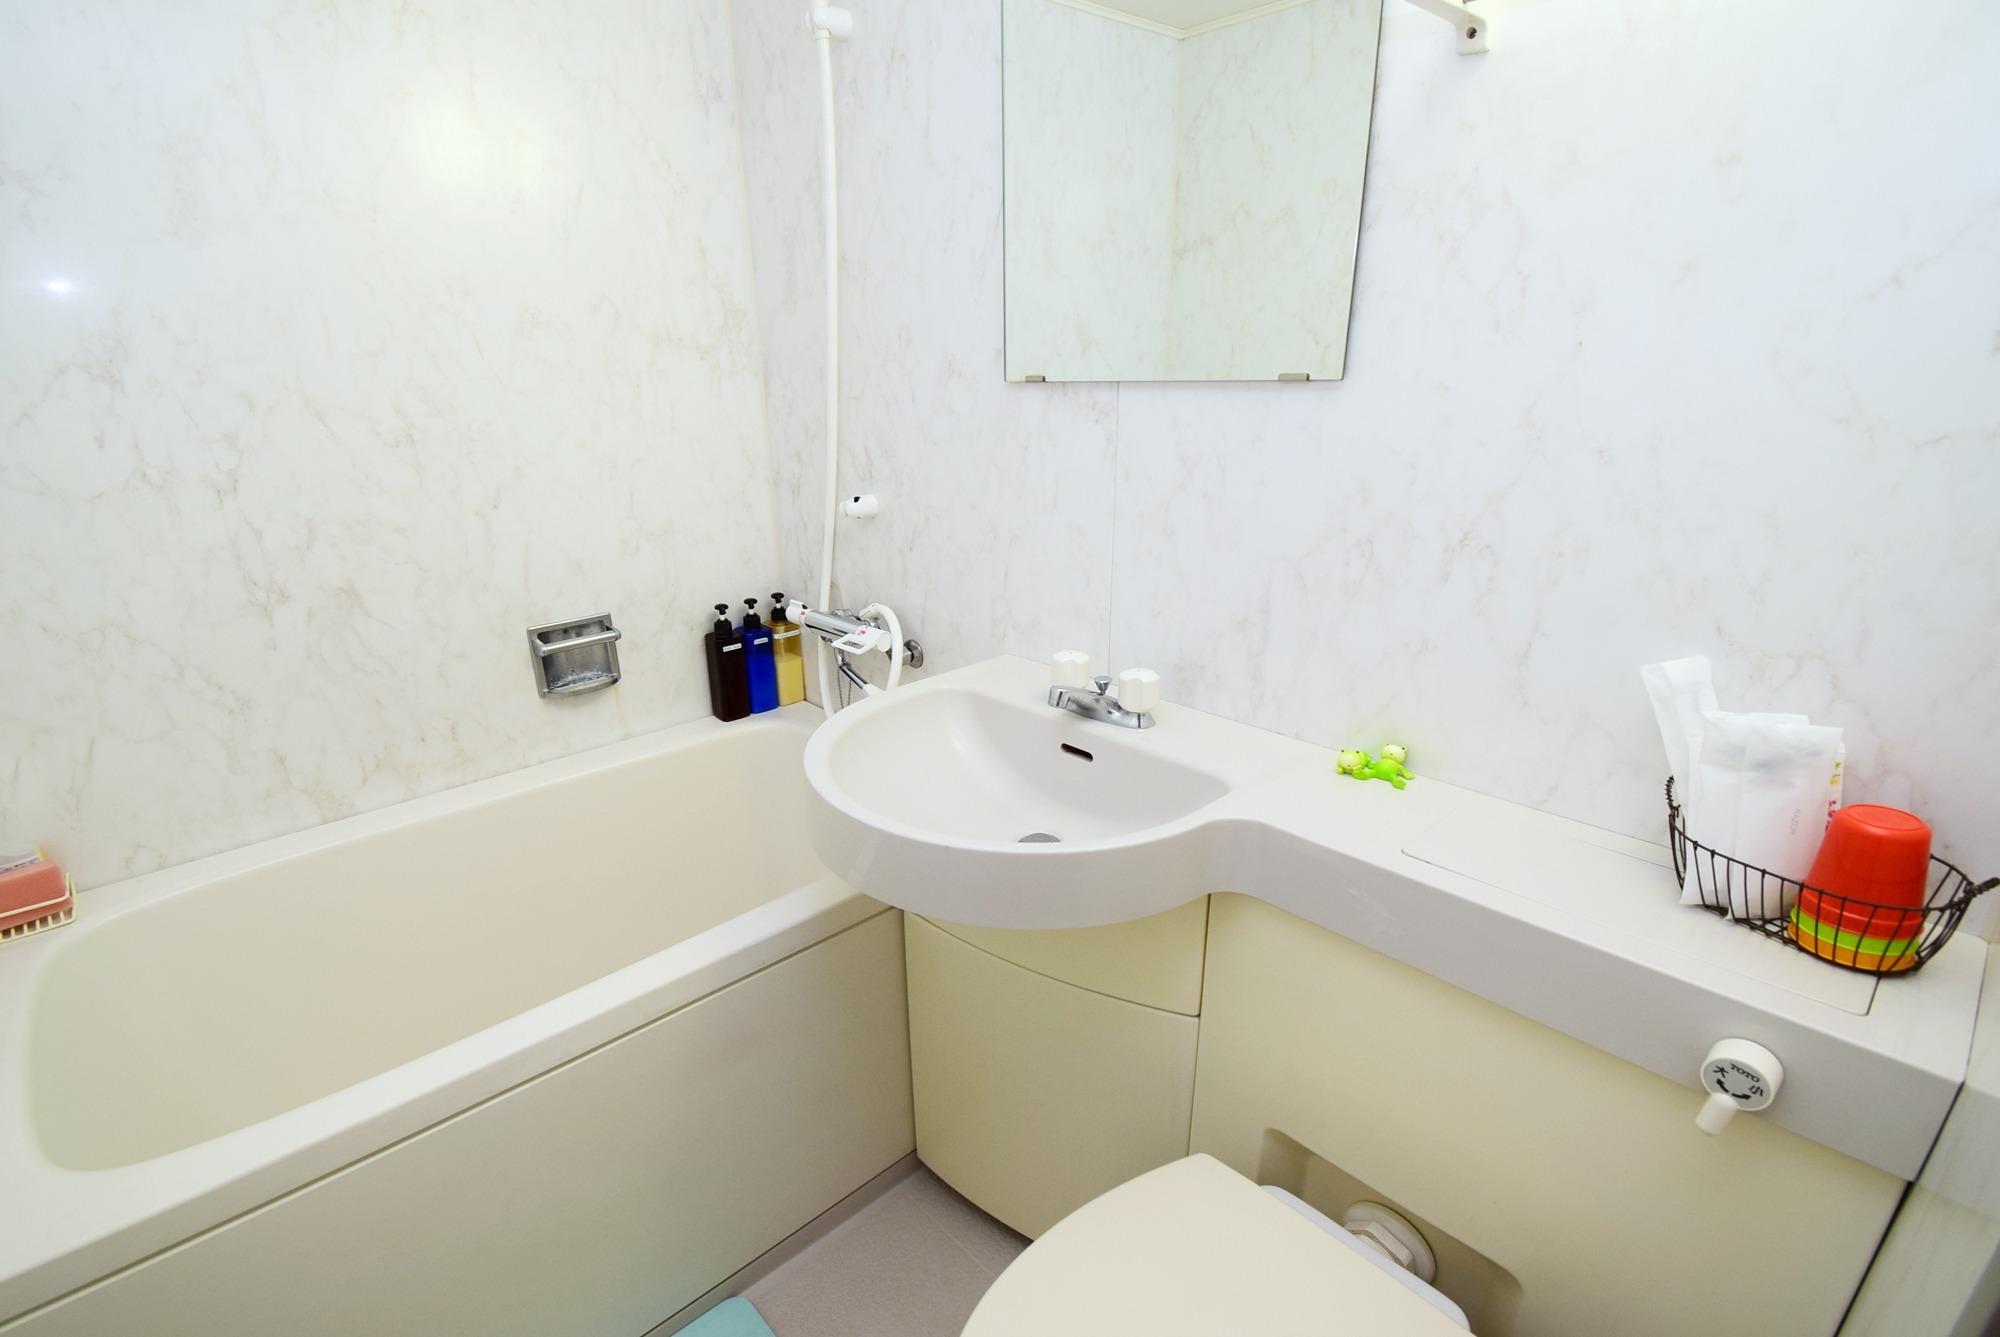 Full amenities. Shampoo, conditioner, body soap, toothbrush, razor, body sponge, etc. are all free.